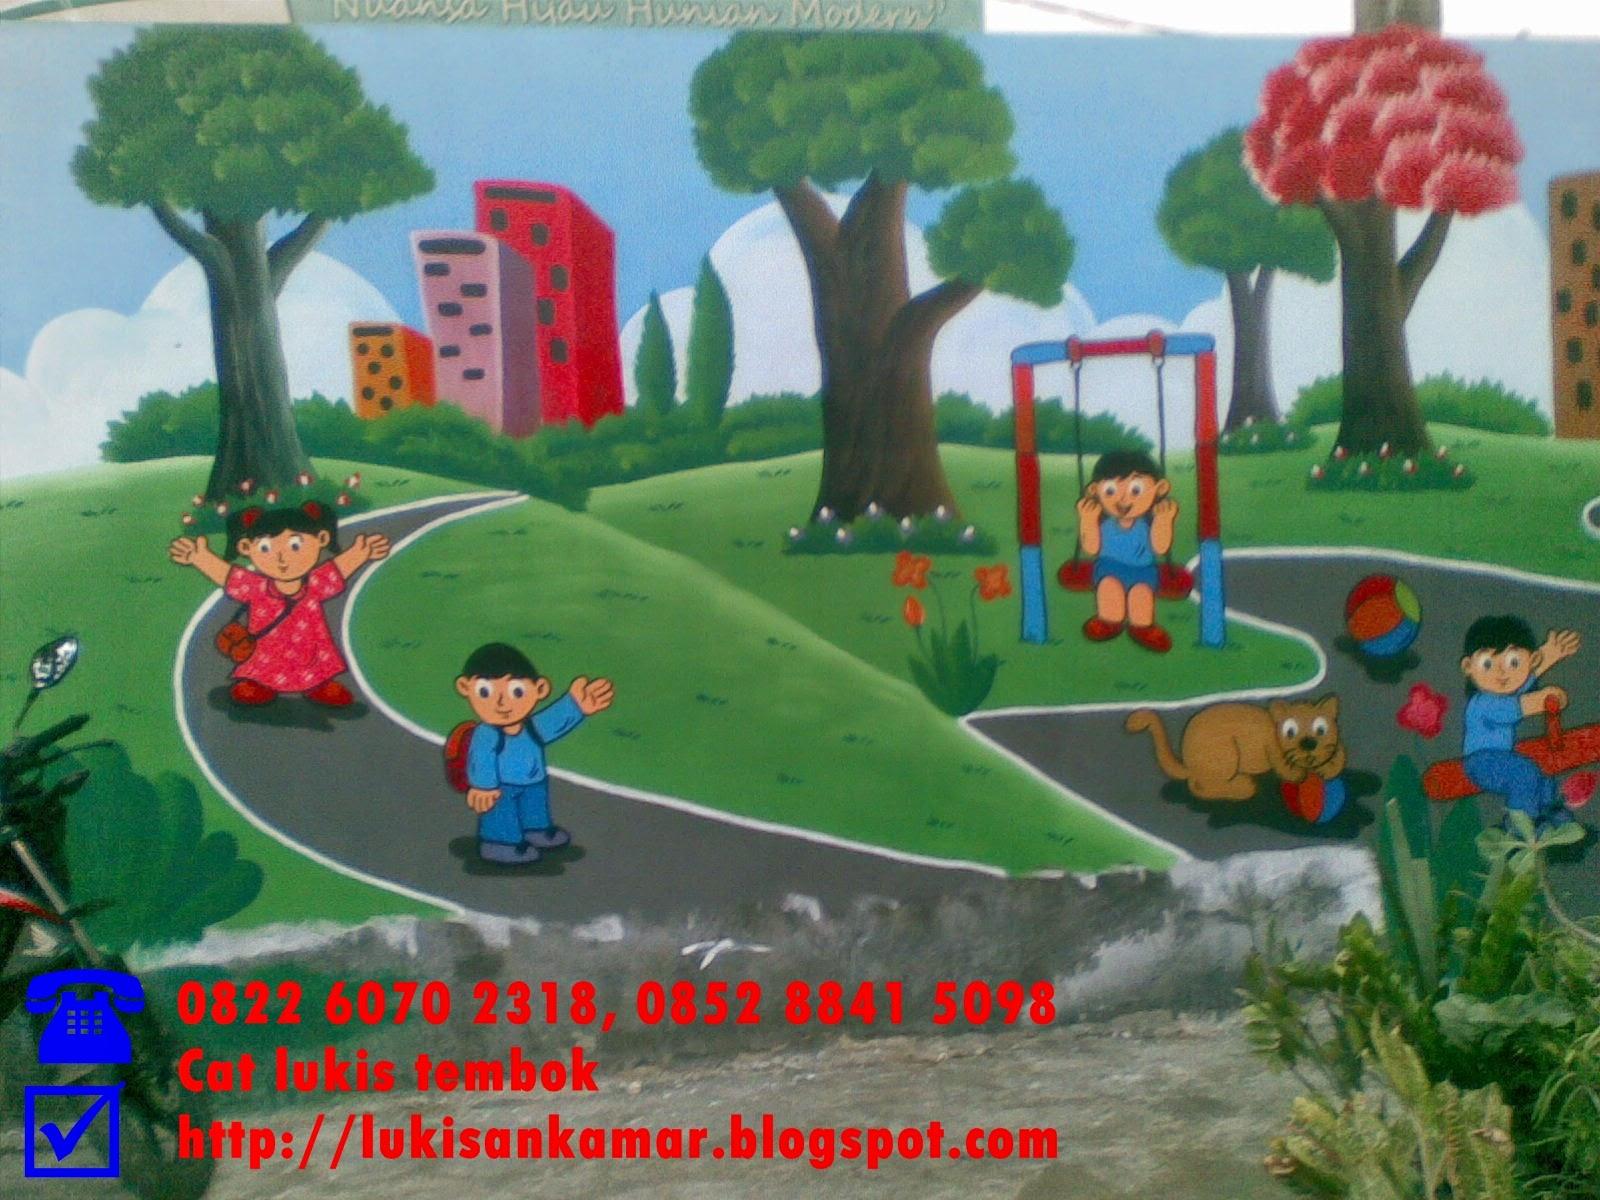 Lukisan Di Dinding Sekolah Tk Cikimmcom